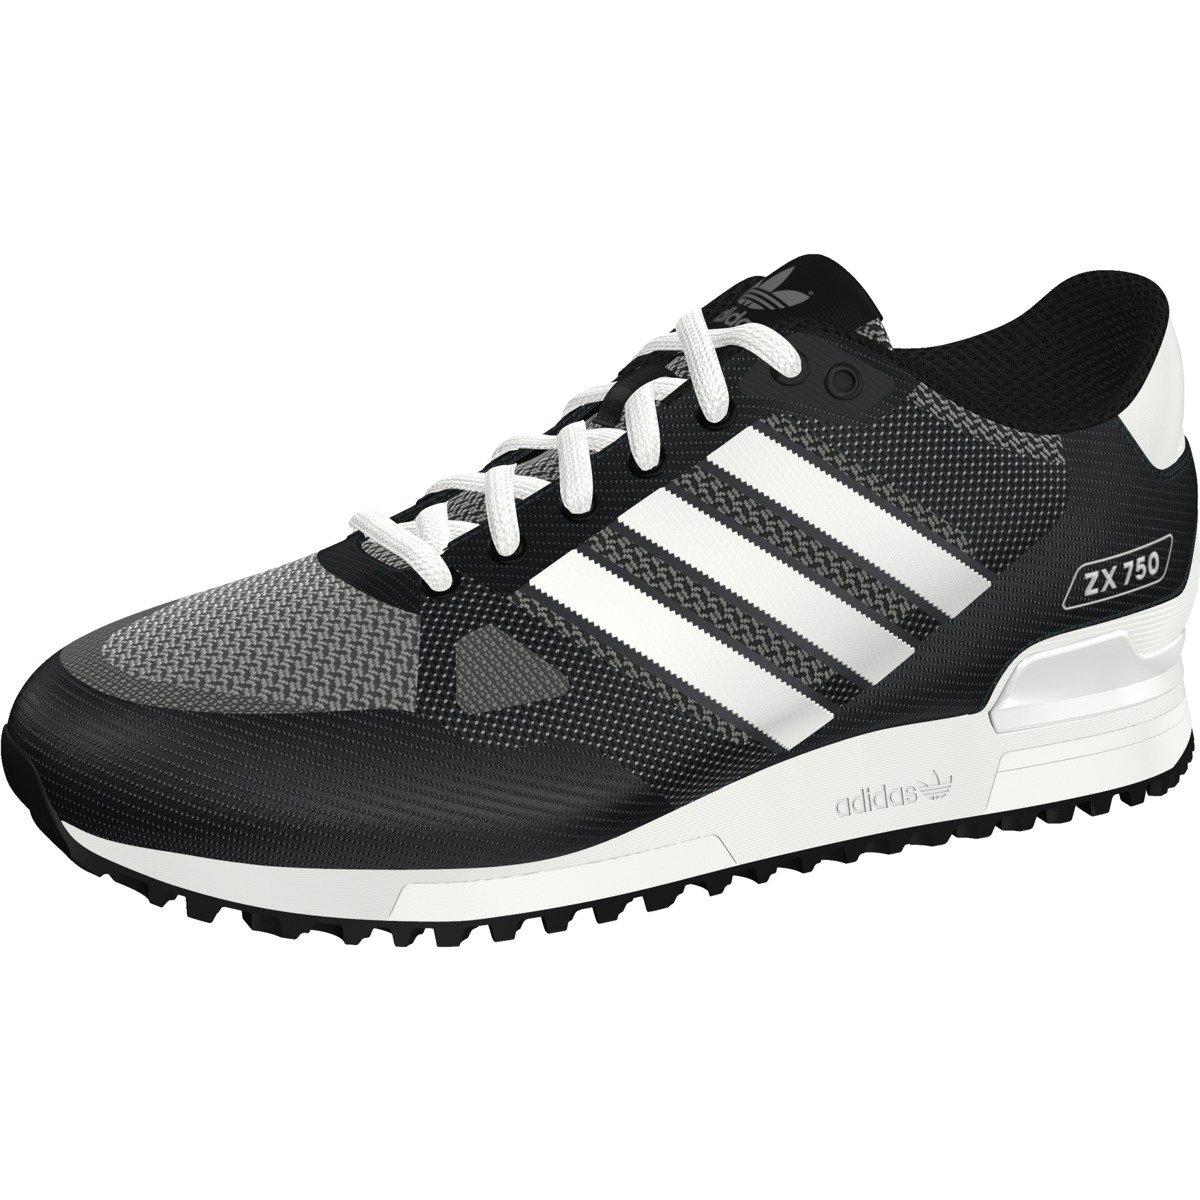 f70545cf45380 ... Adidas ZX 750 WV Shoes - BB1222 ...